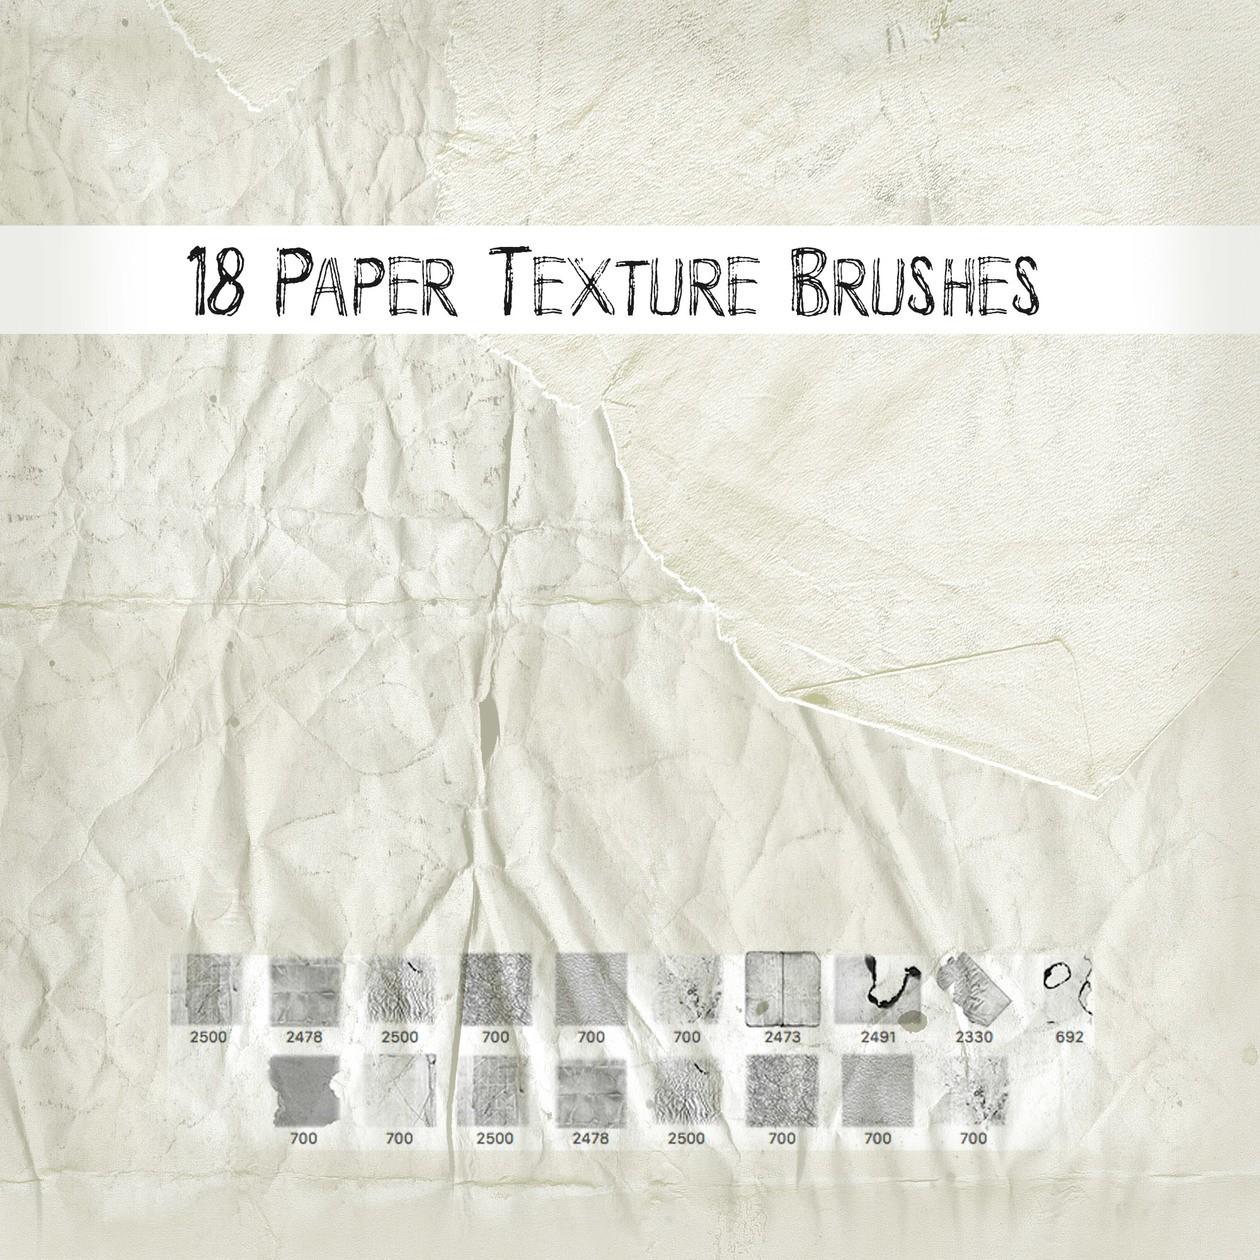 Paper Texture Brushes Photoshop brush